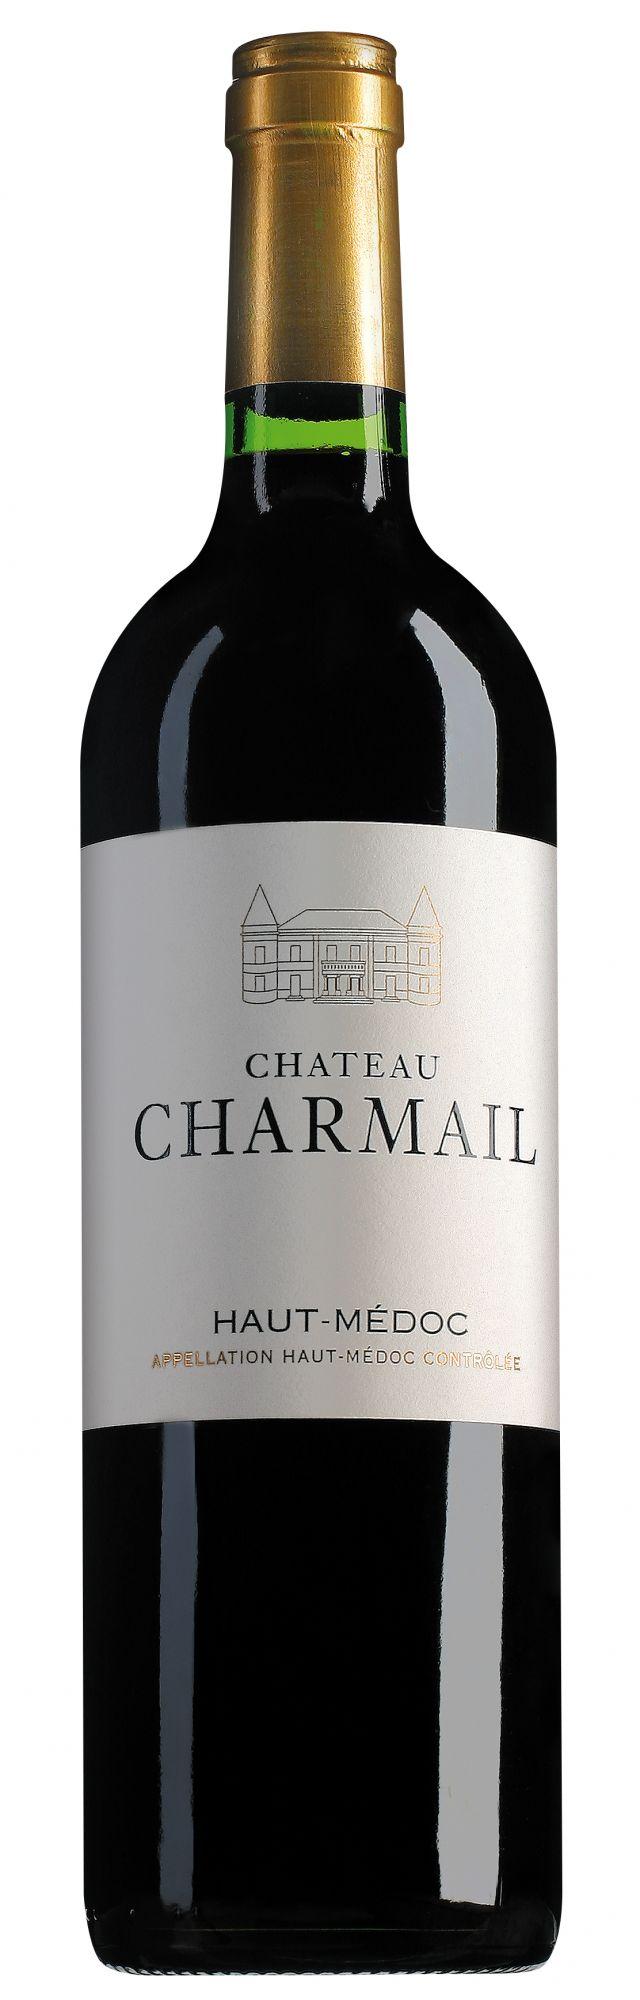 Château Charmail Haut-Médoc